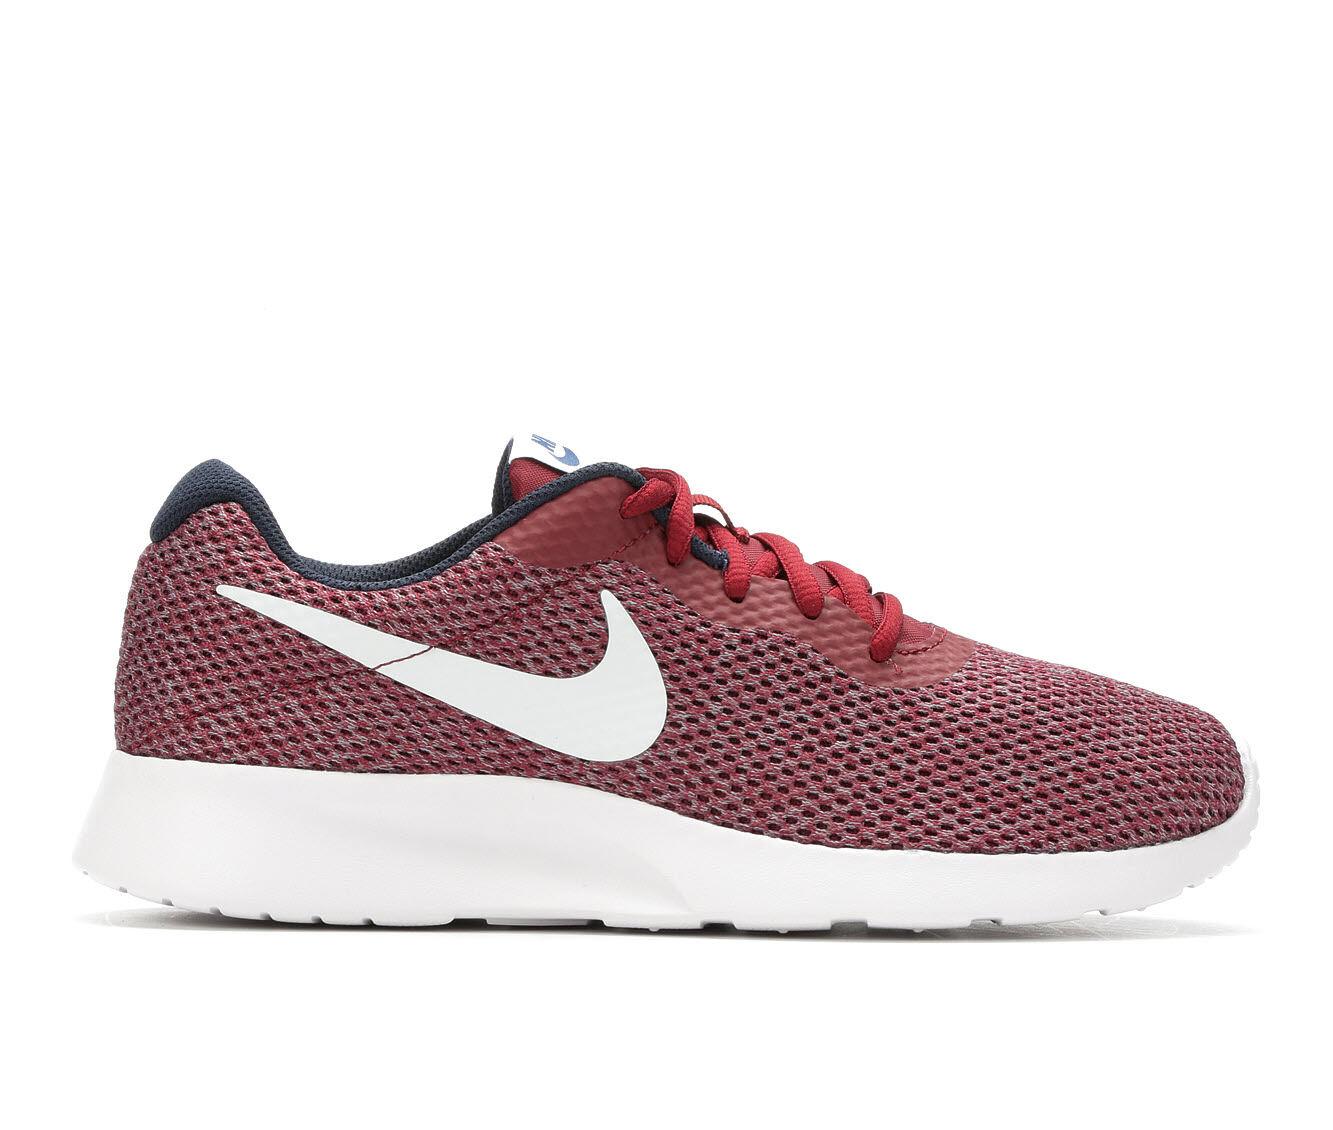 huge discount 8a377 b2c11 ... shopping mens nike tanjun se sneakers a8343 5c1f9